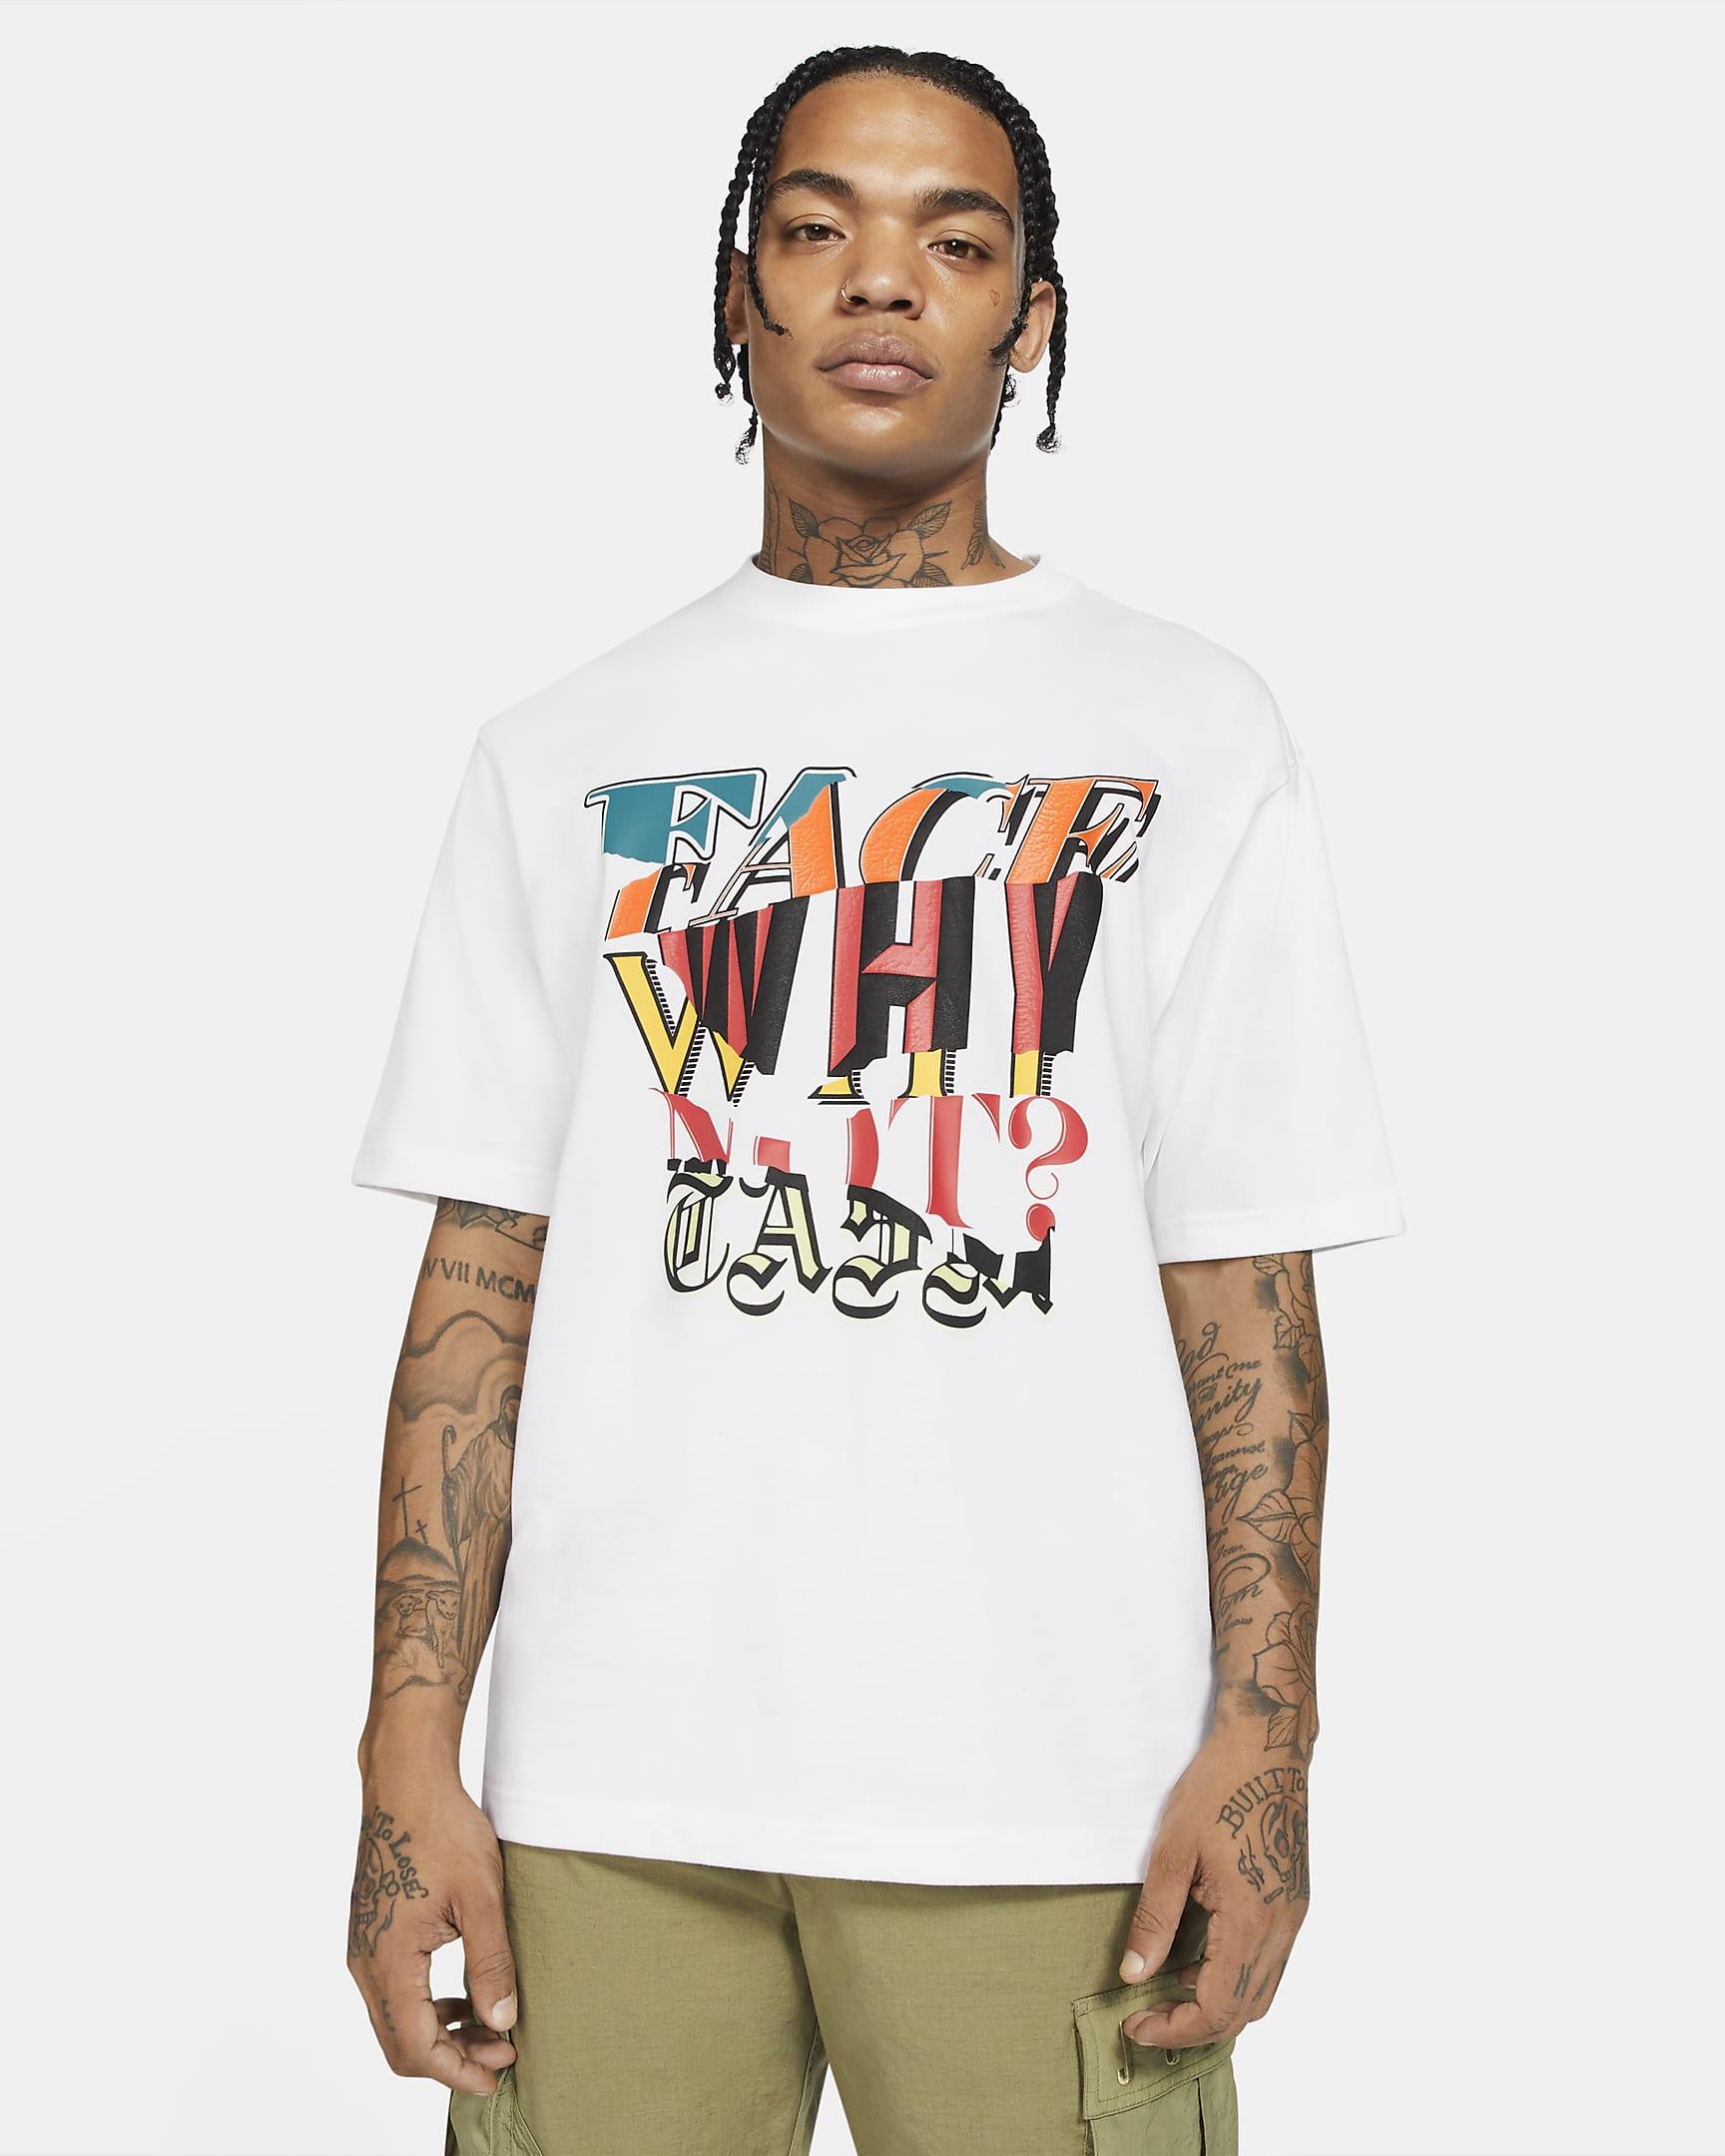 jordan-why-not-x-facetasm-mens-short-sleeve-t-shirt-0vQxFQ